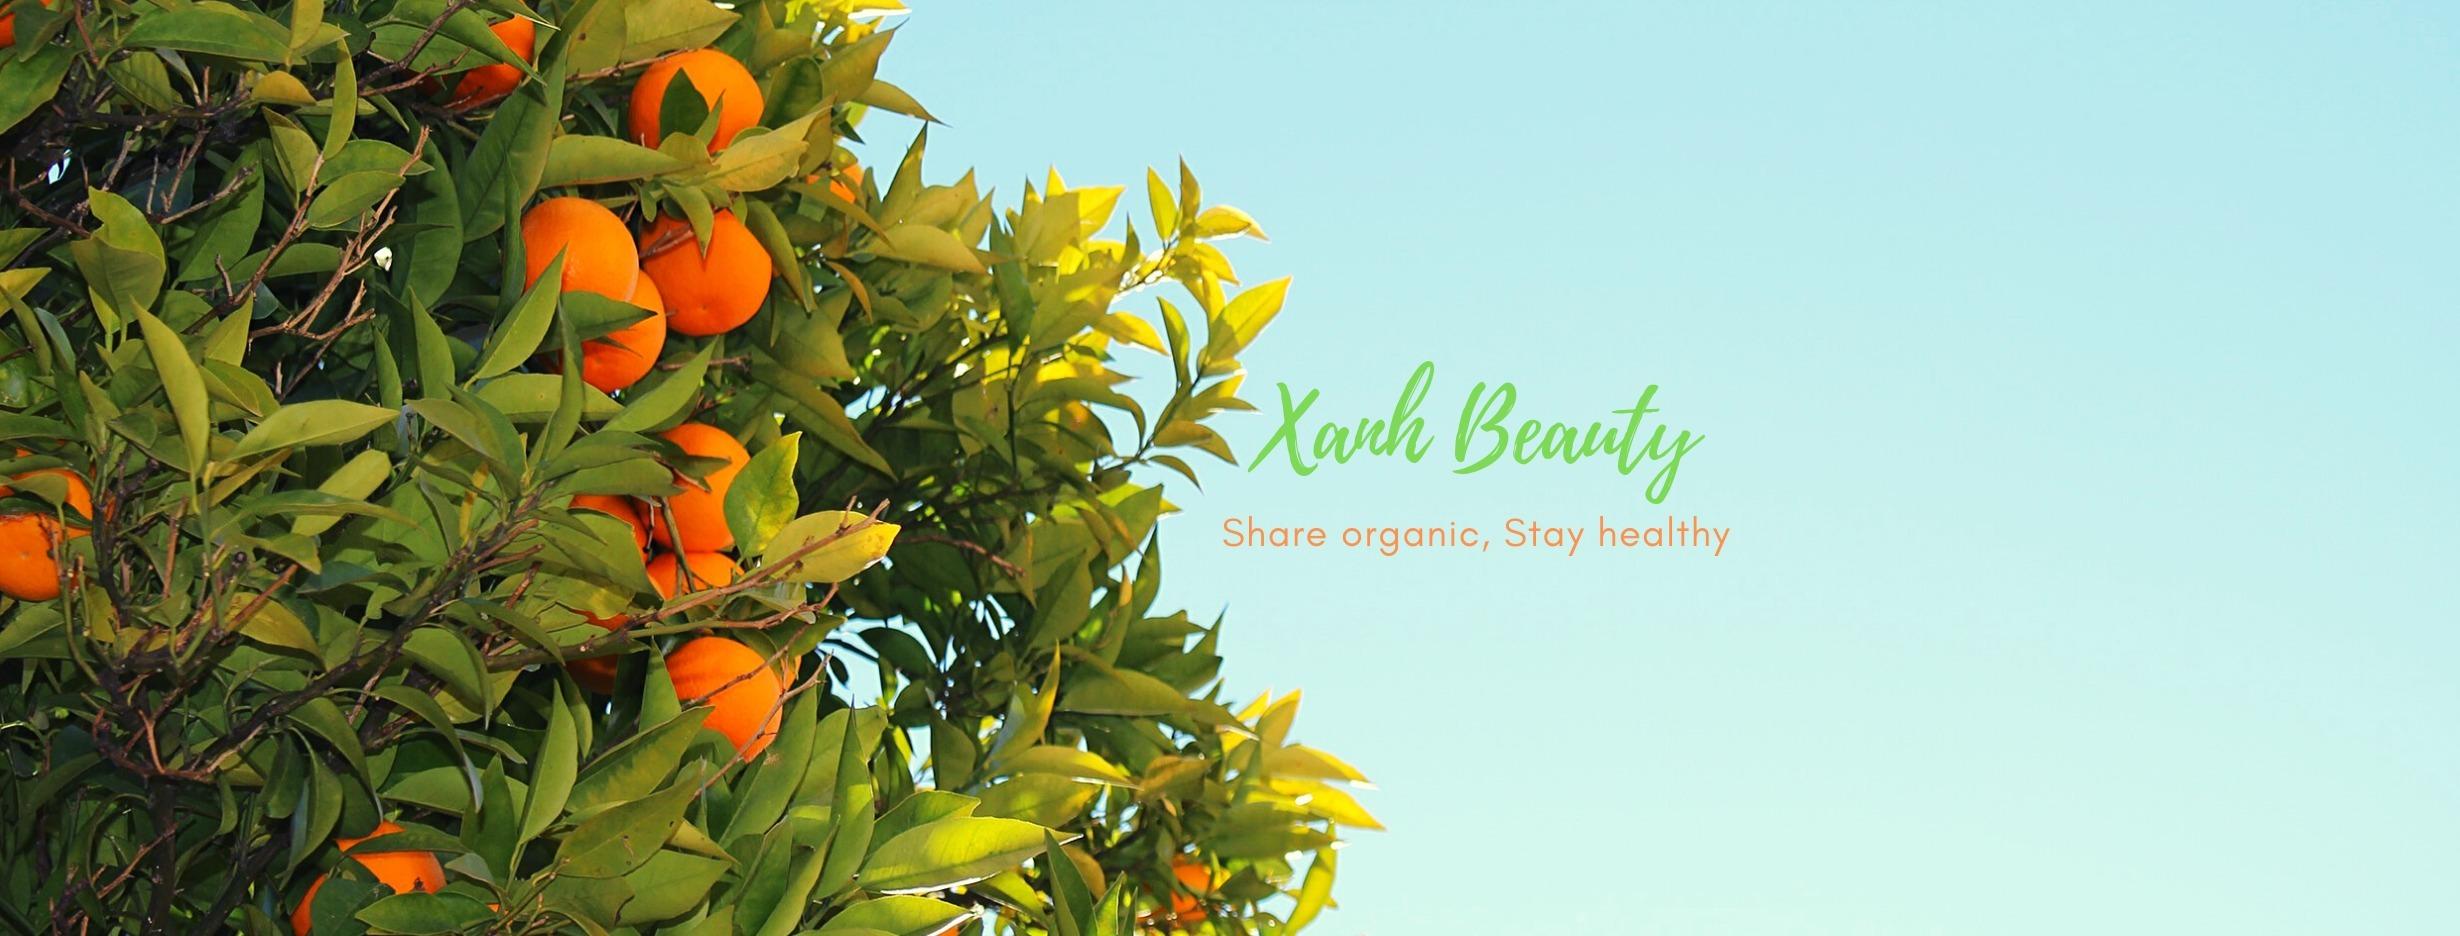 Xanh Beauty (@xanhbeauty) Cover Image